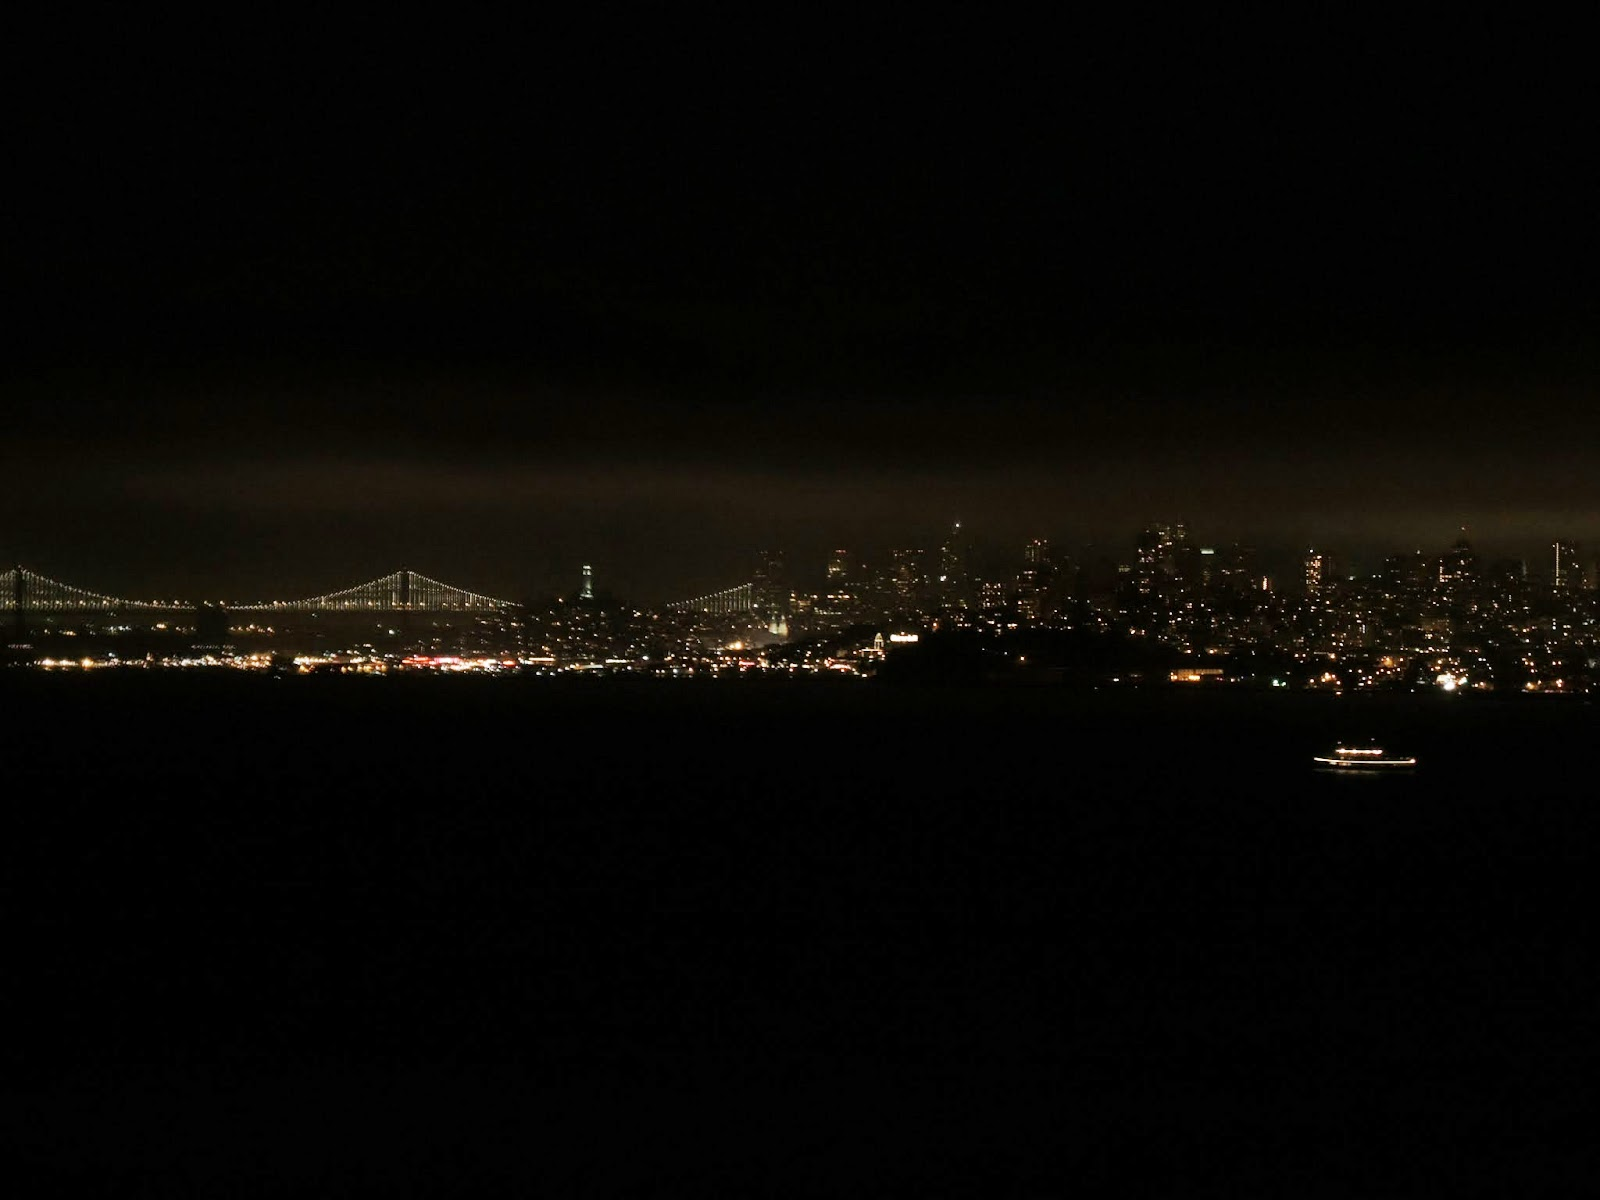 San Francisco夜景